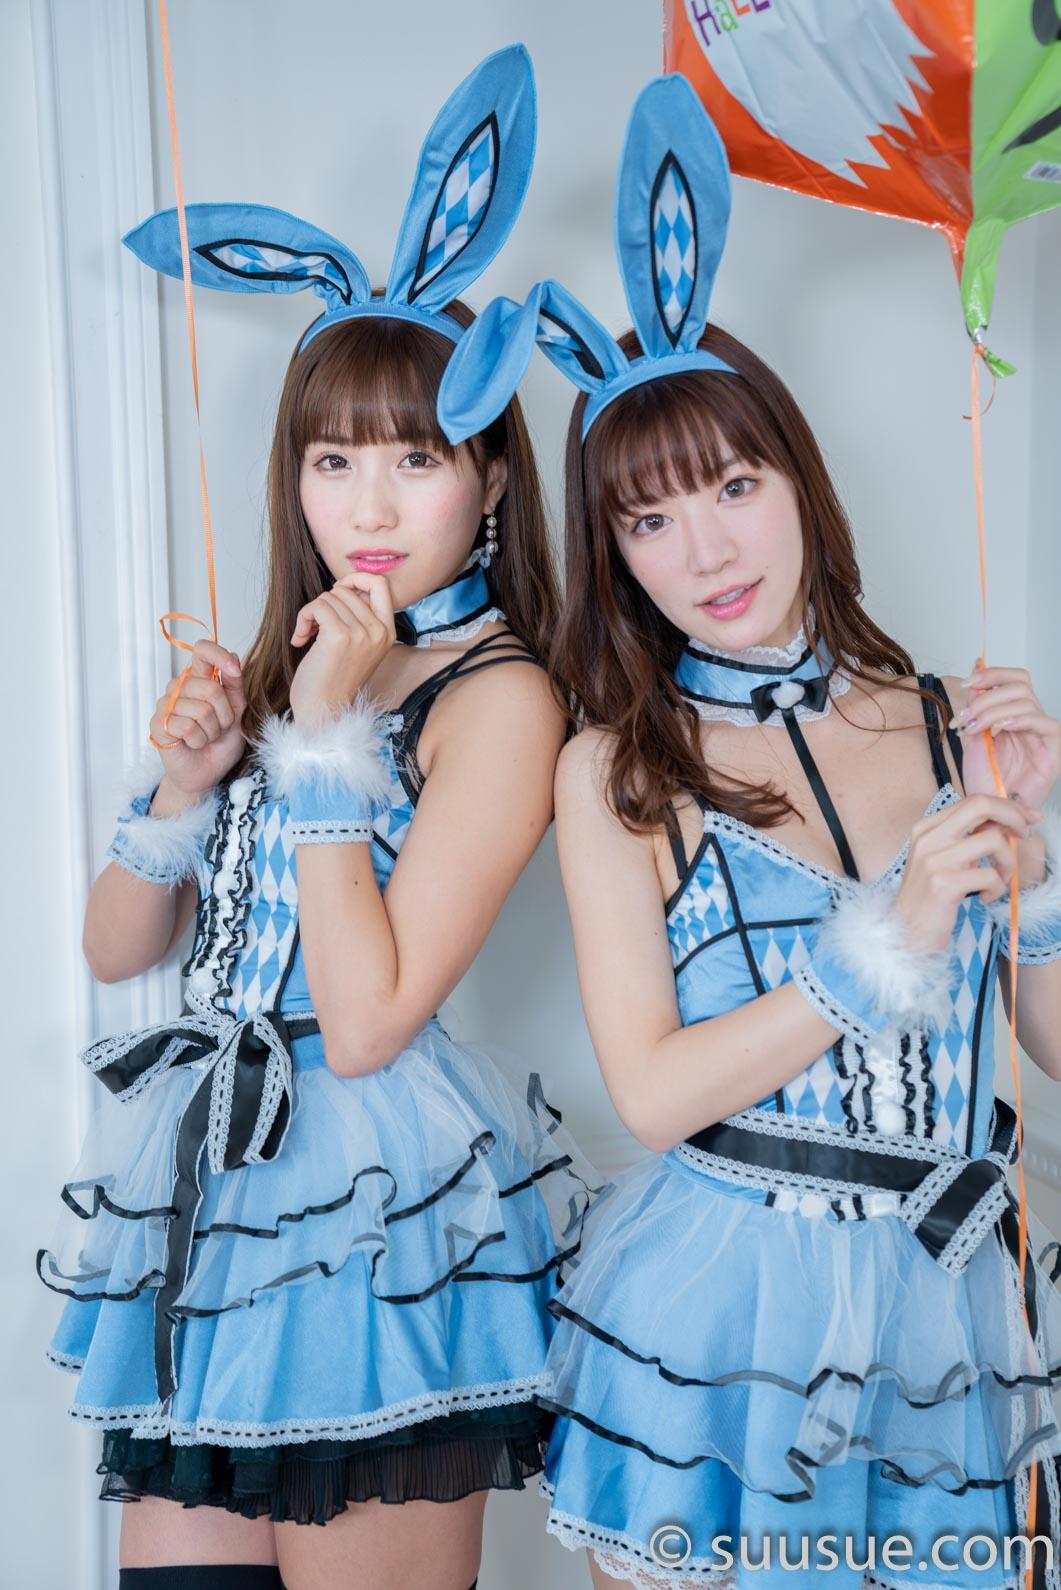 2018/10/28 NewType撮影会 小嶋みやび&空陸海ゆきな バニーガール